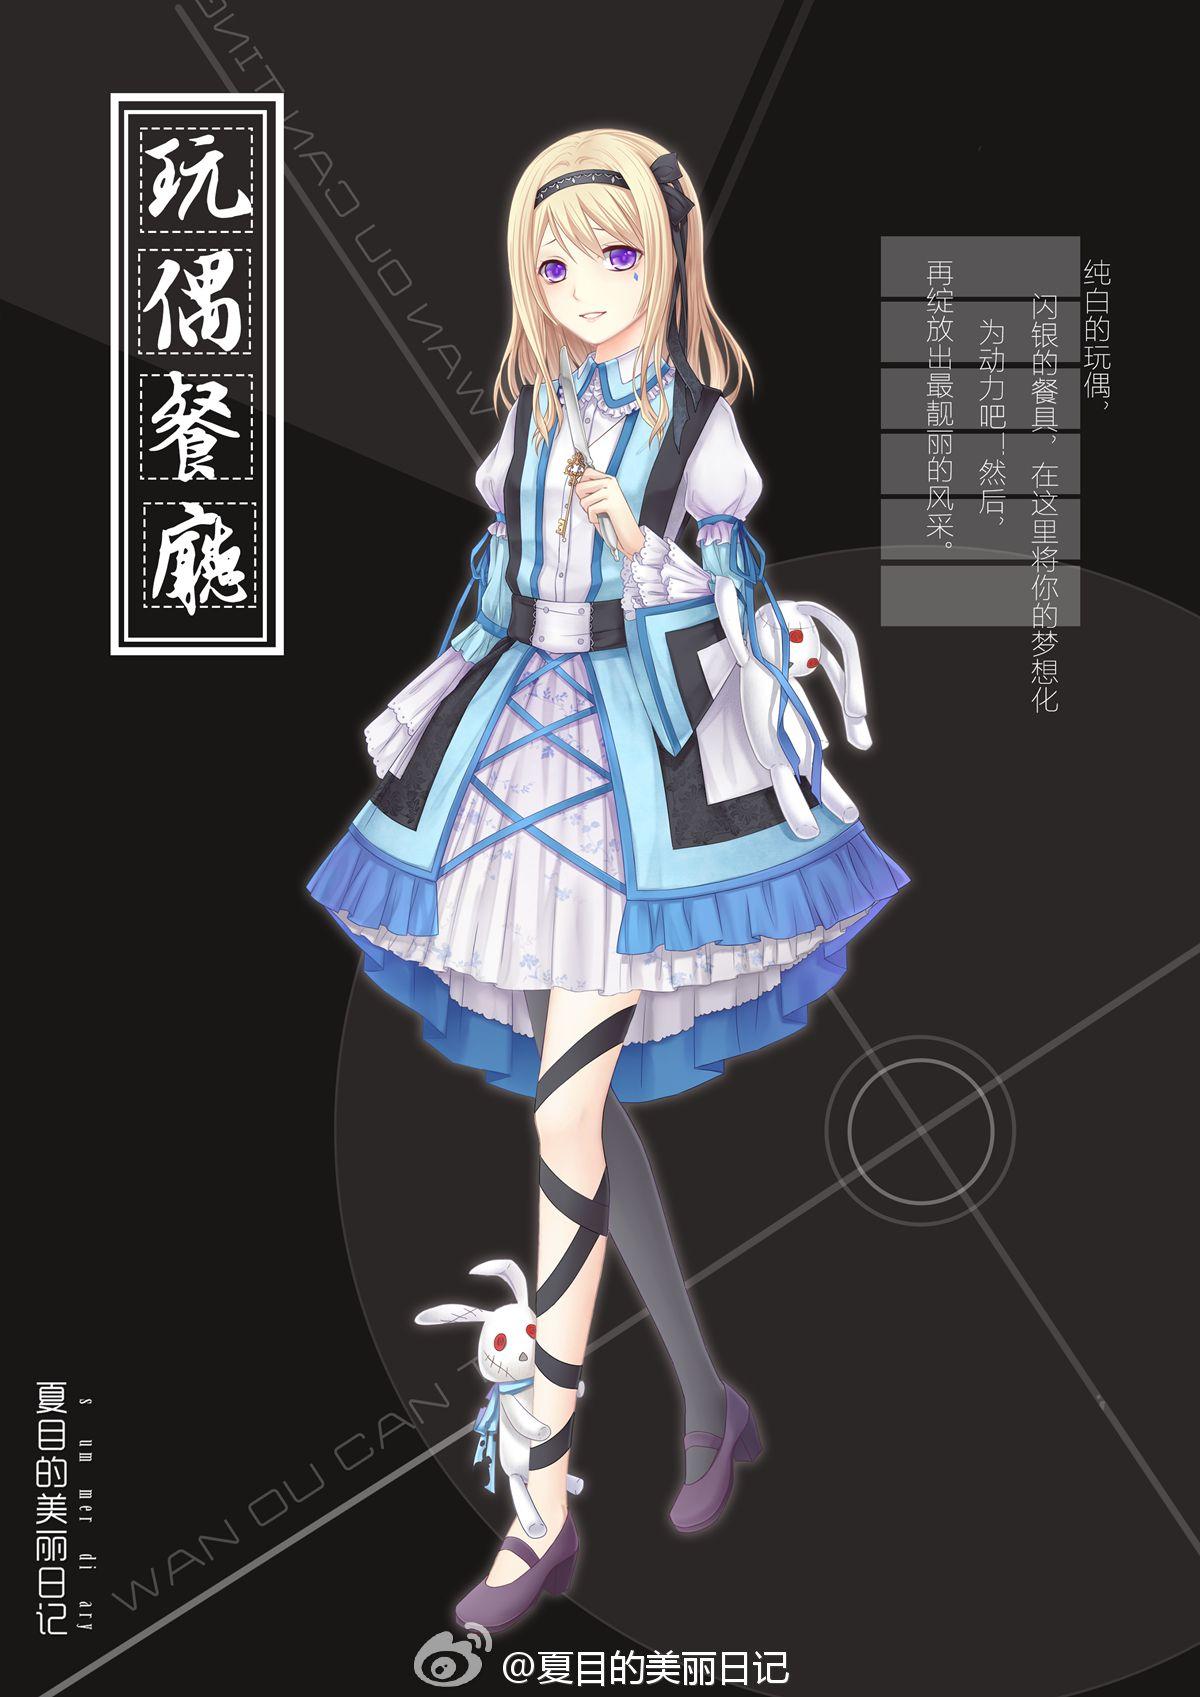 Anime Music Girl Dress Up